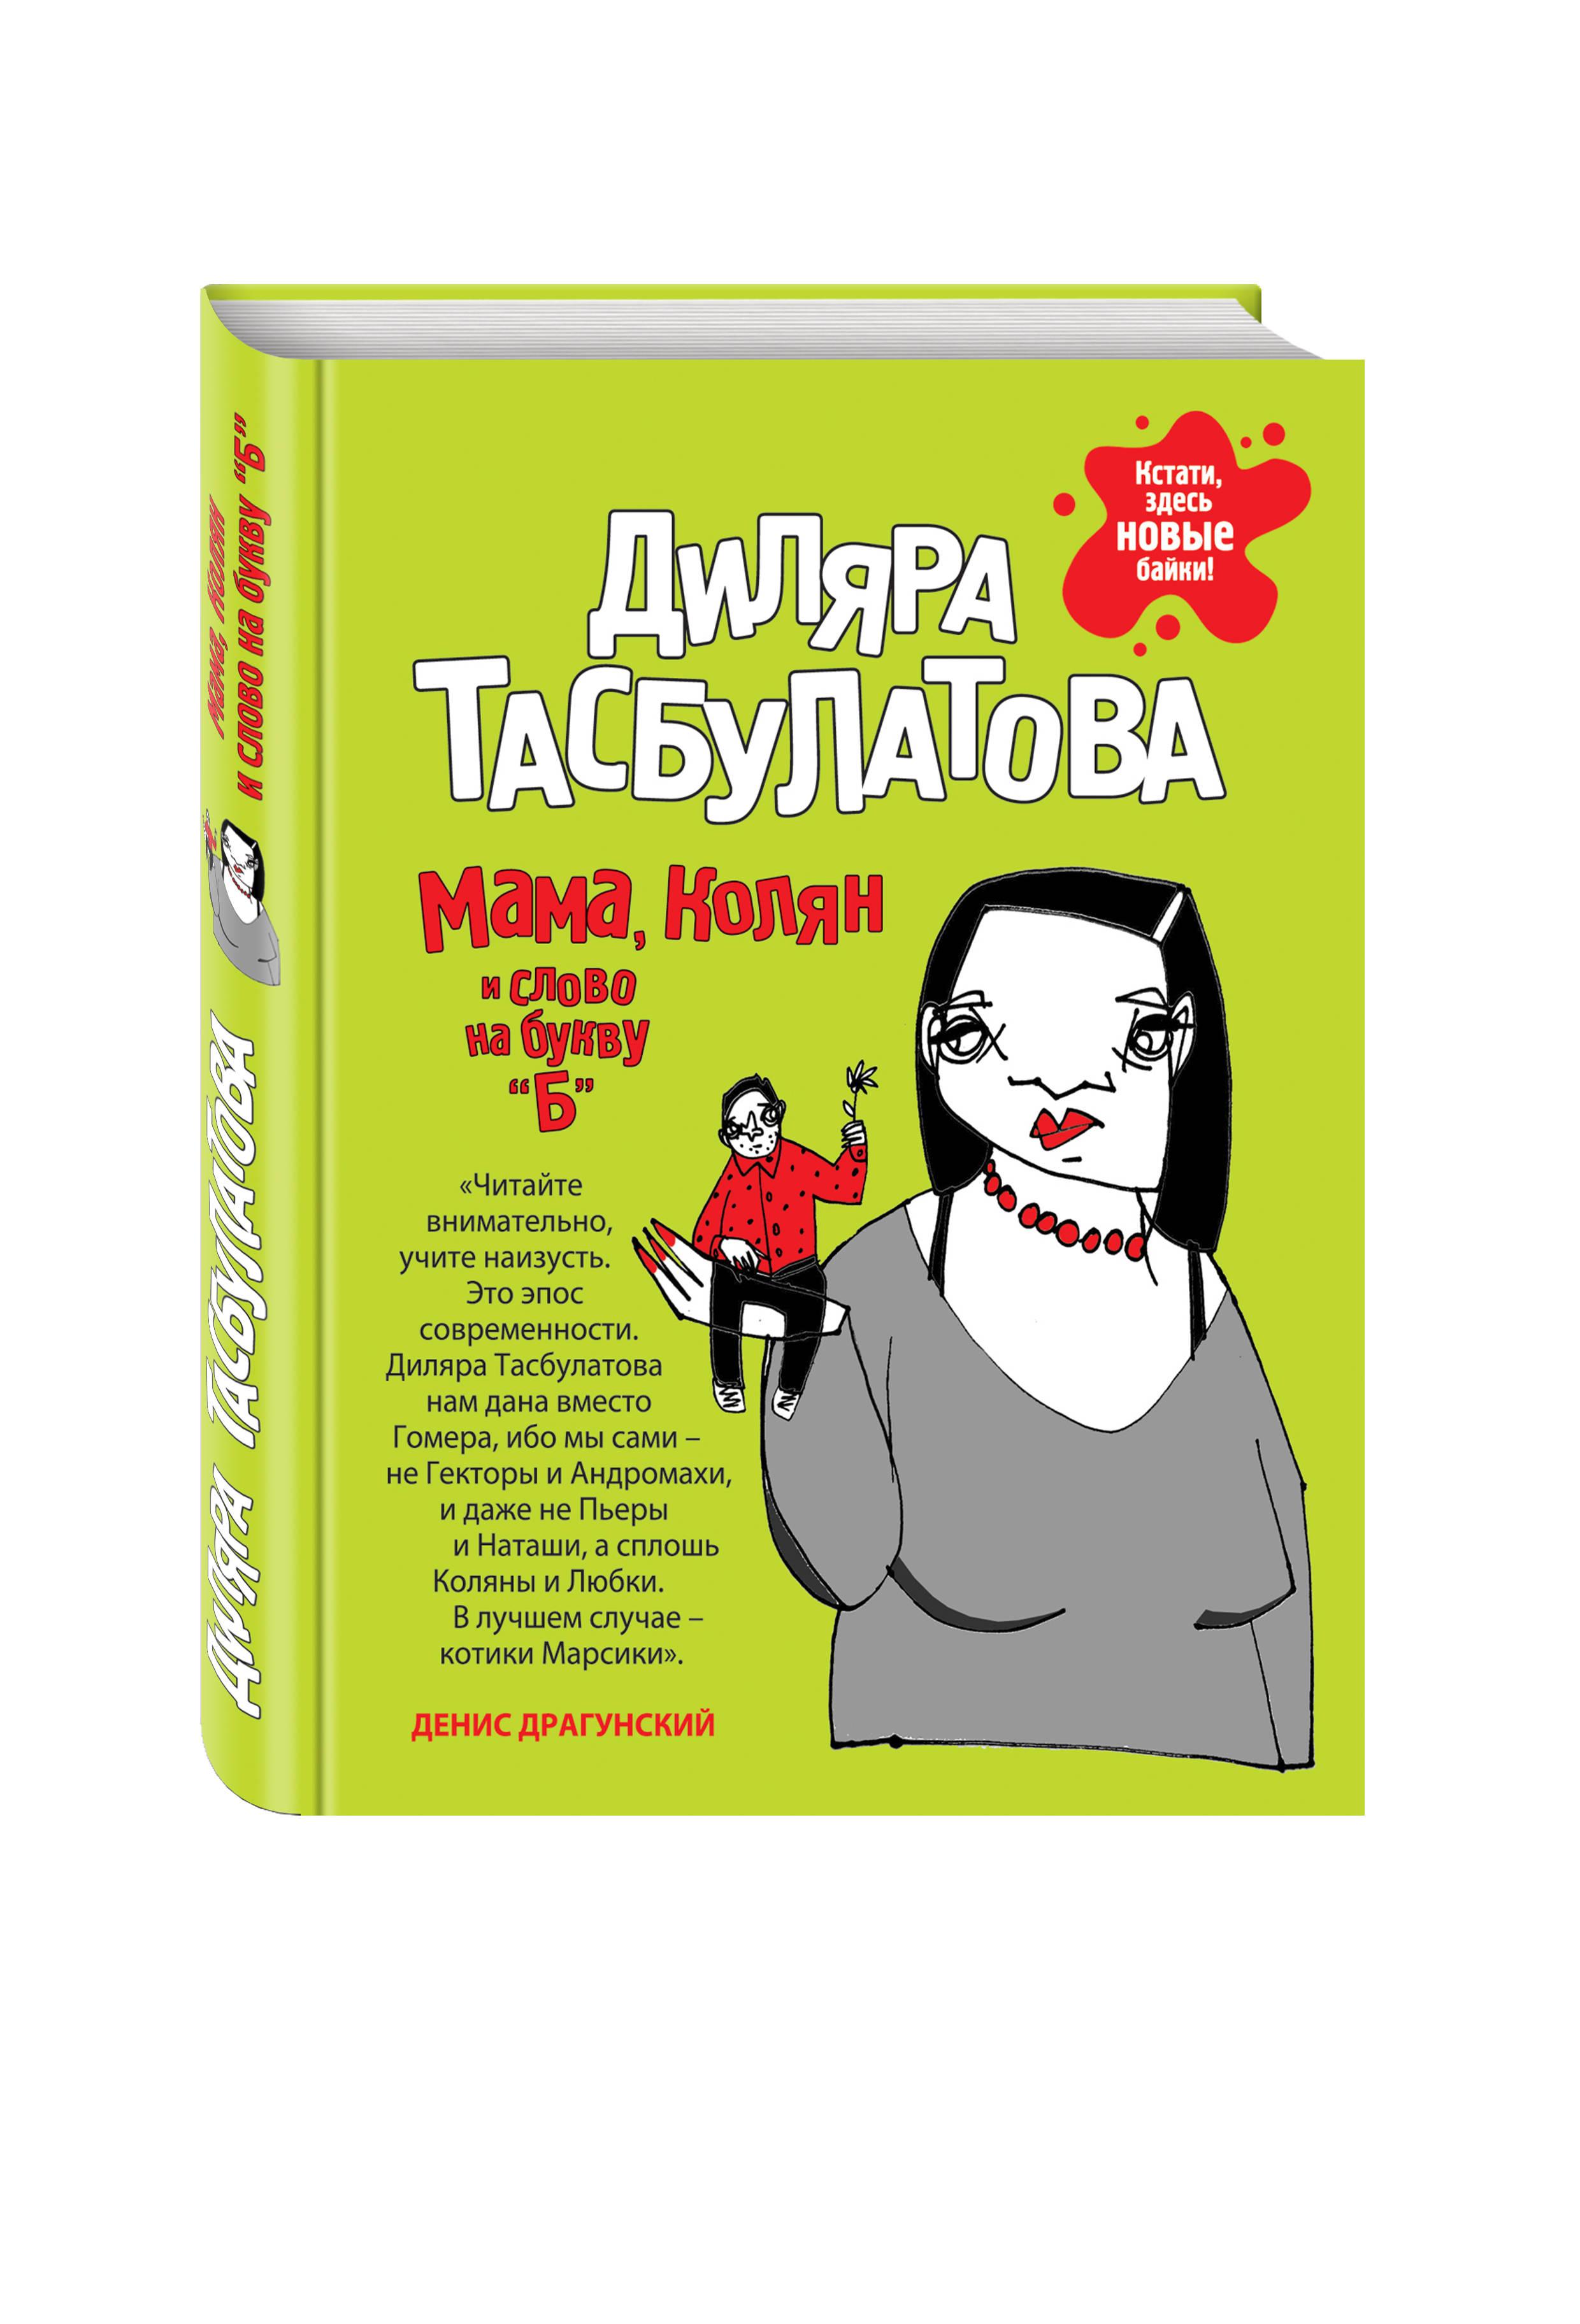 Тасбулатова Д. Мама, Колян и слово на букву «б»